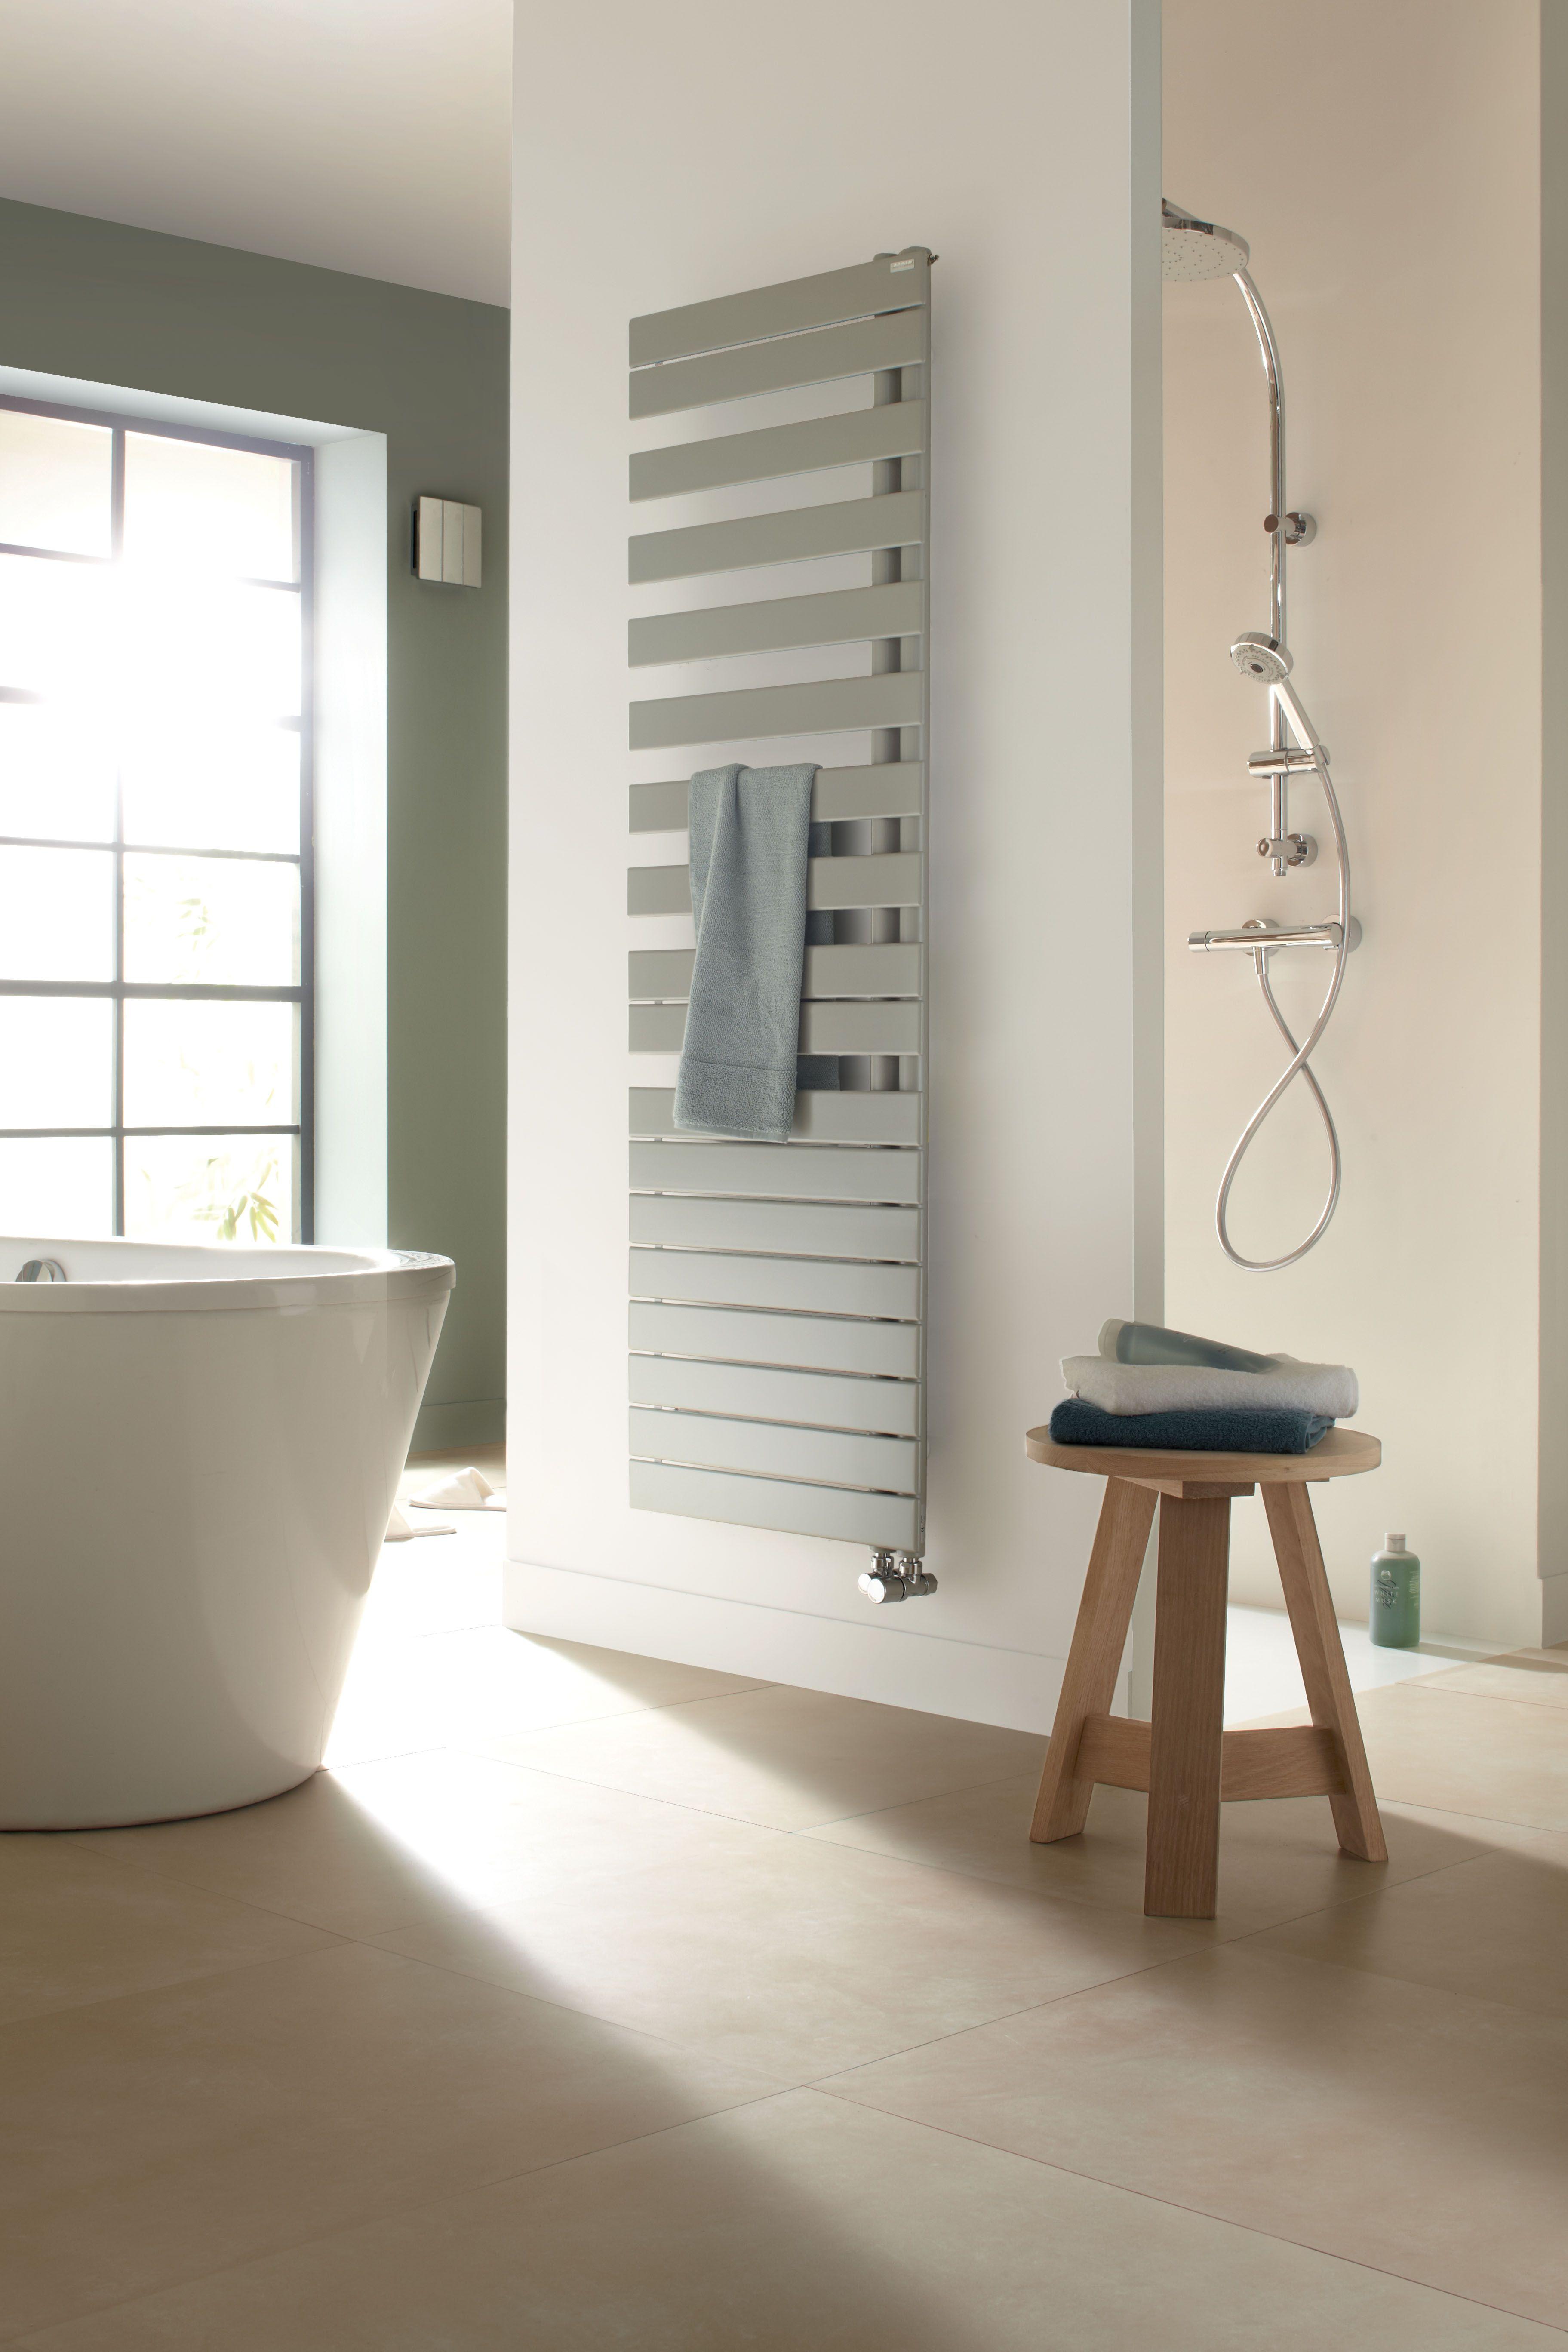 radiateur sche serviettes acova fassane spa - Acova Radiateur Salle De Bain